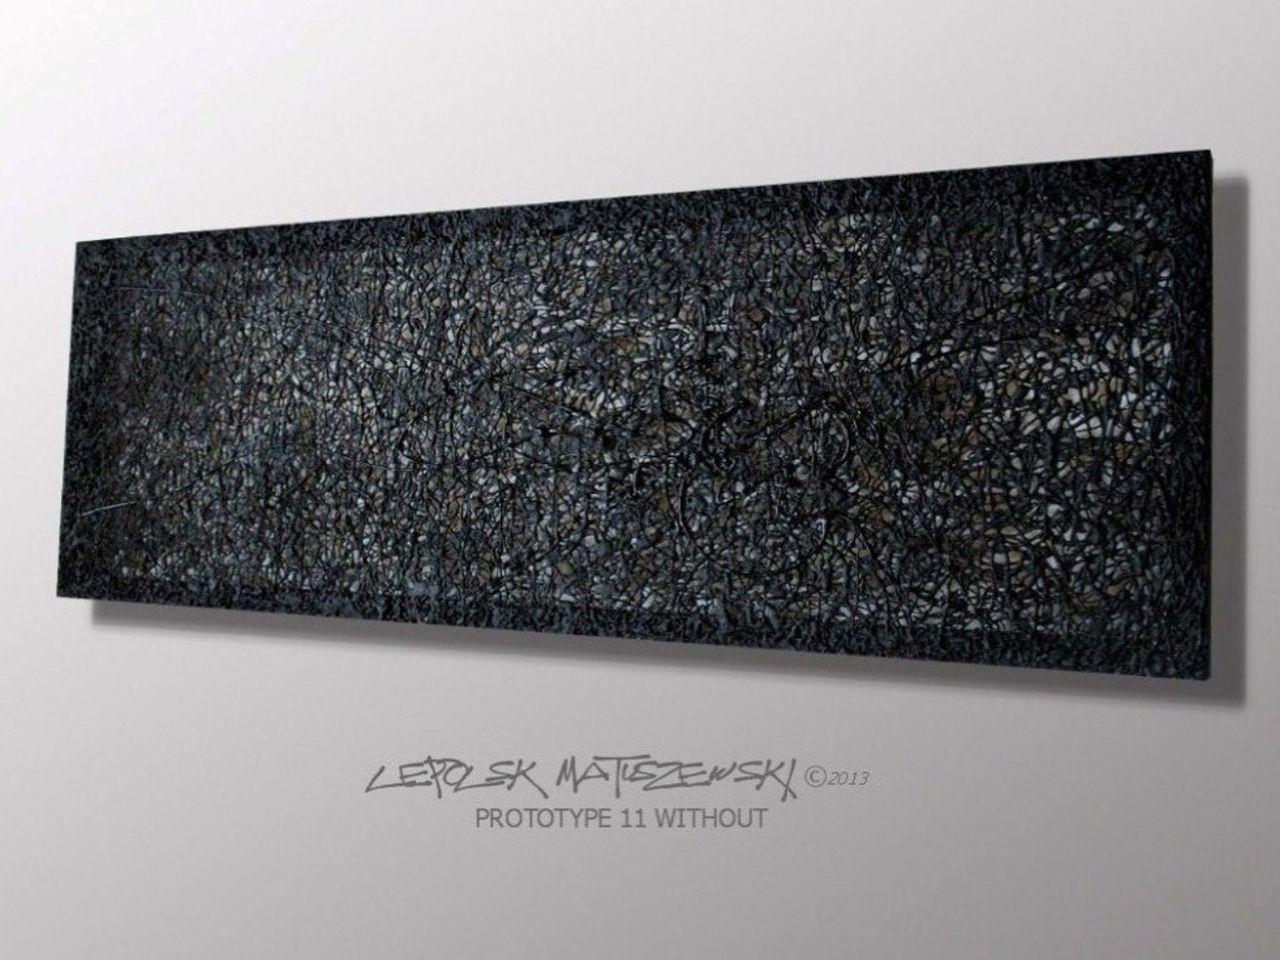 MK  Lepolsk Matuszewski PROTOTYPE 11 WITHOUT   Abstract expressionism  expressionnisme abstrait